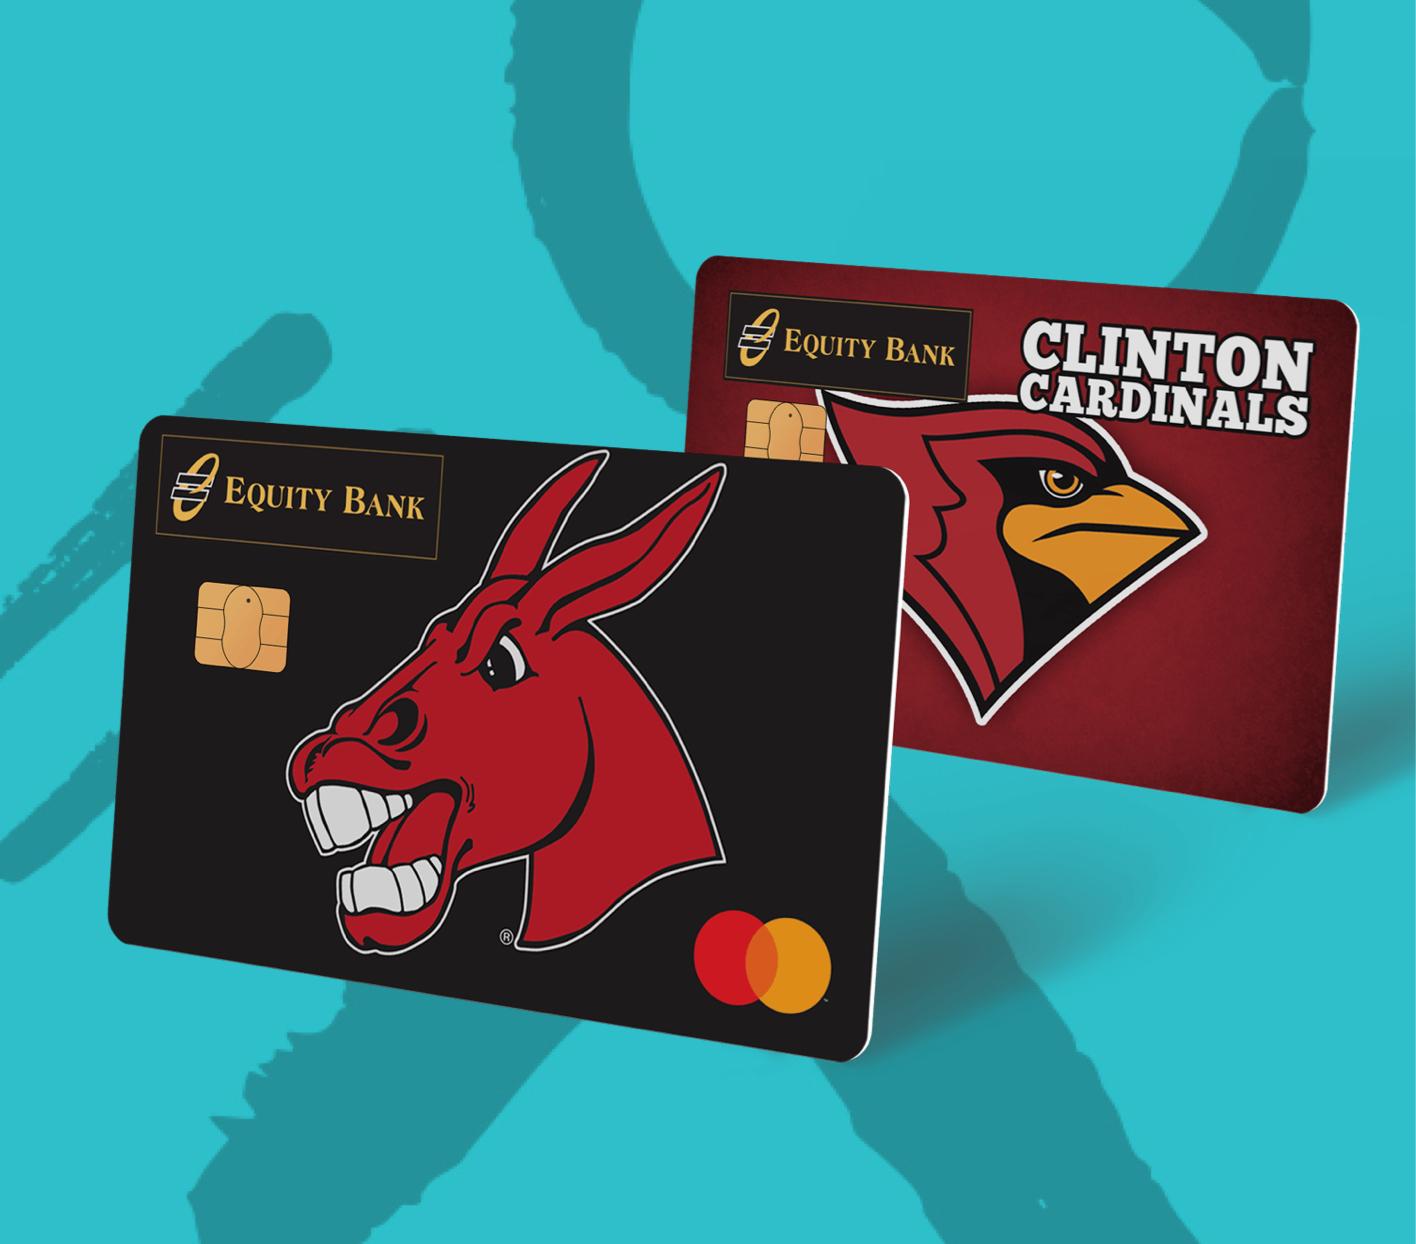 Two personalized debit card designs.